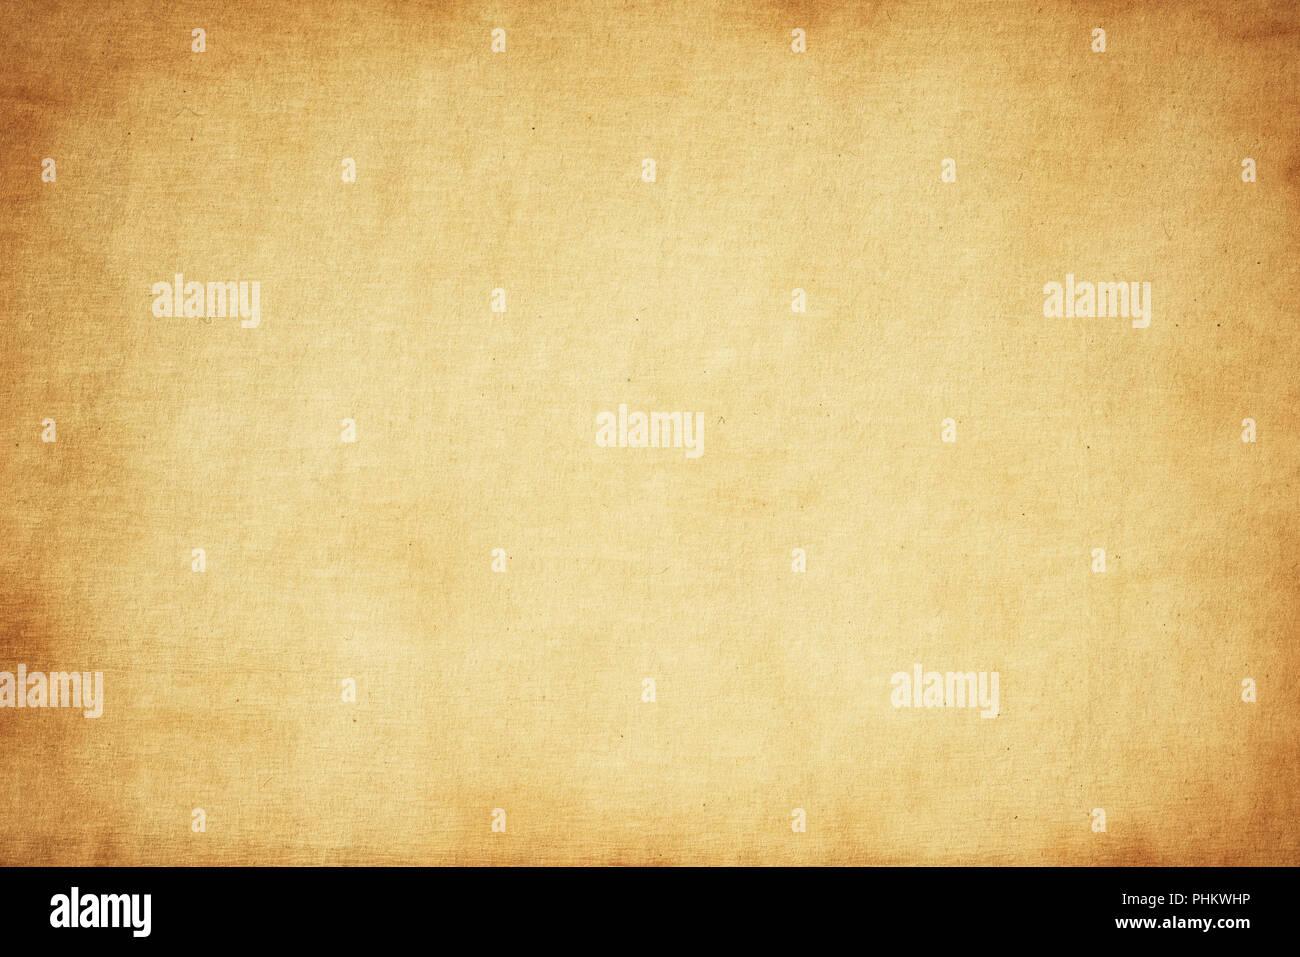 Vintage paper texture. High resolution grunge background. - Stock Image